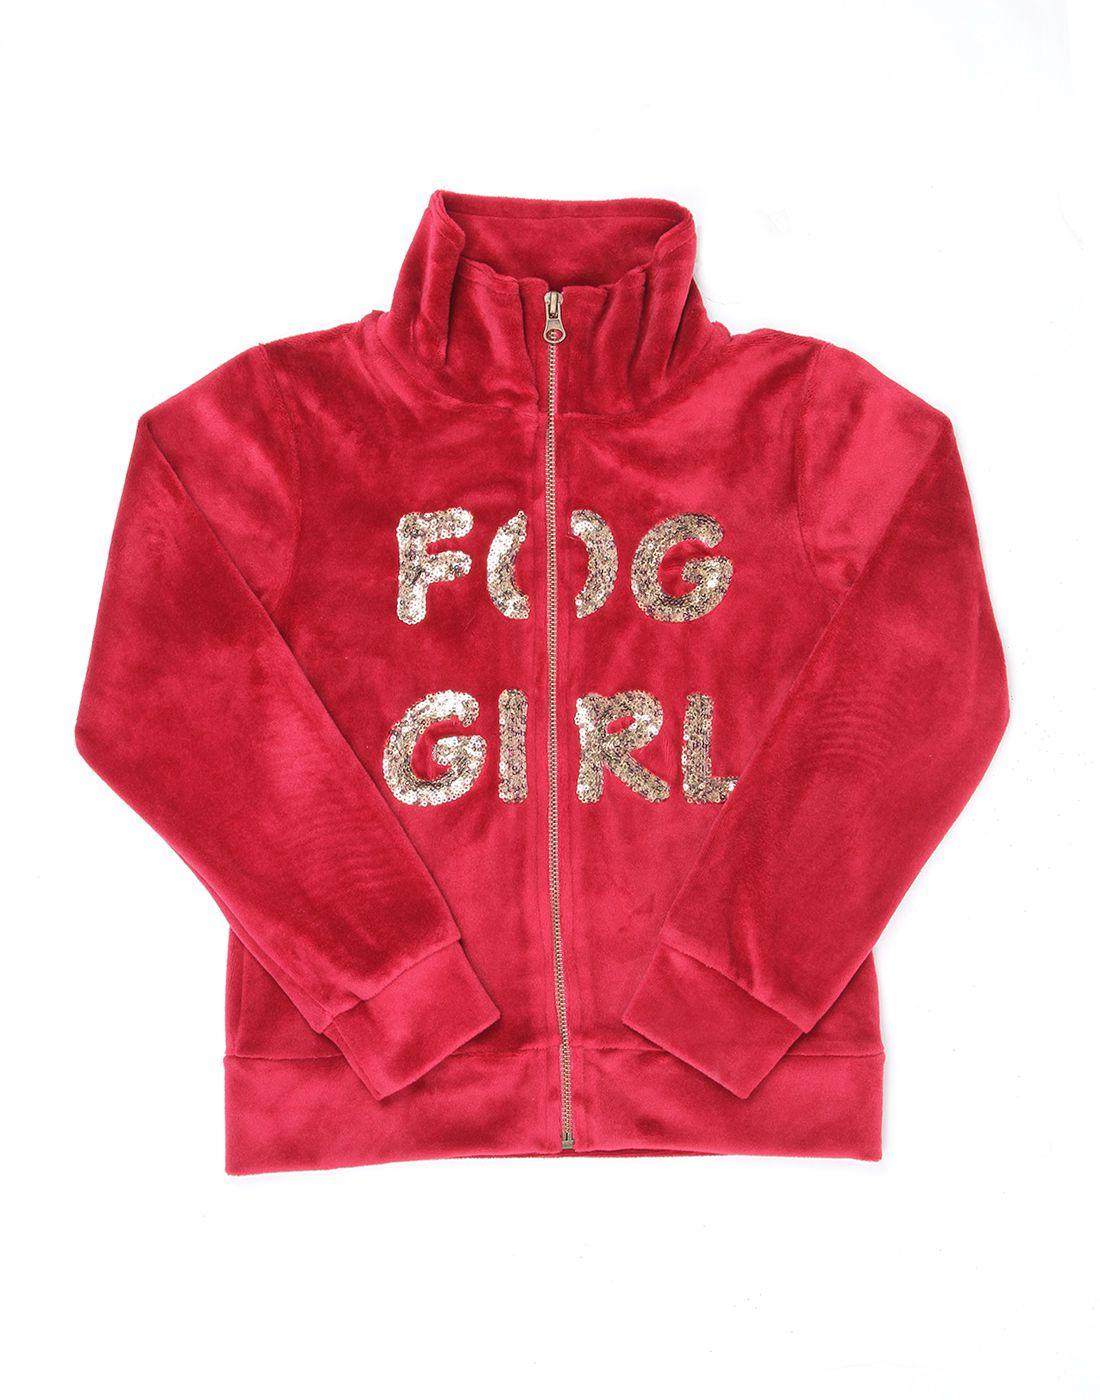 London Fog Girls Maroon Full Sleeve Jacket